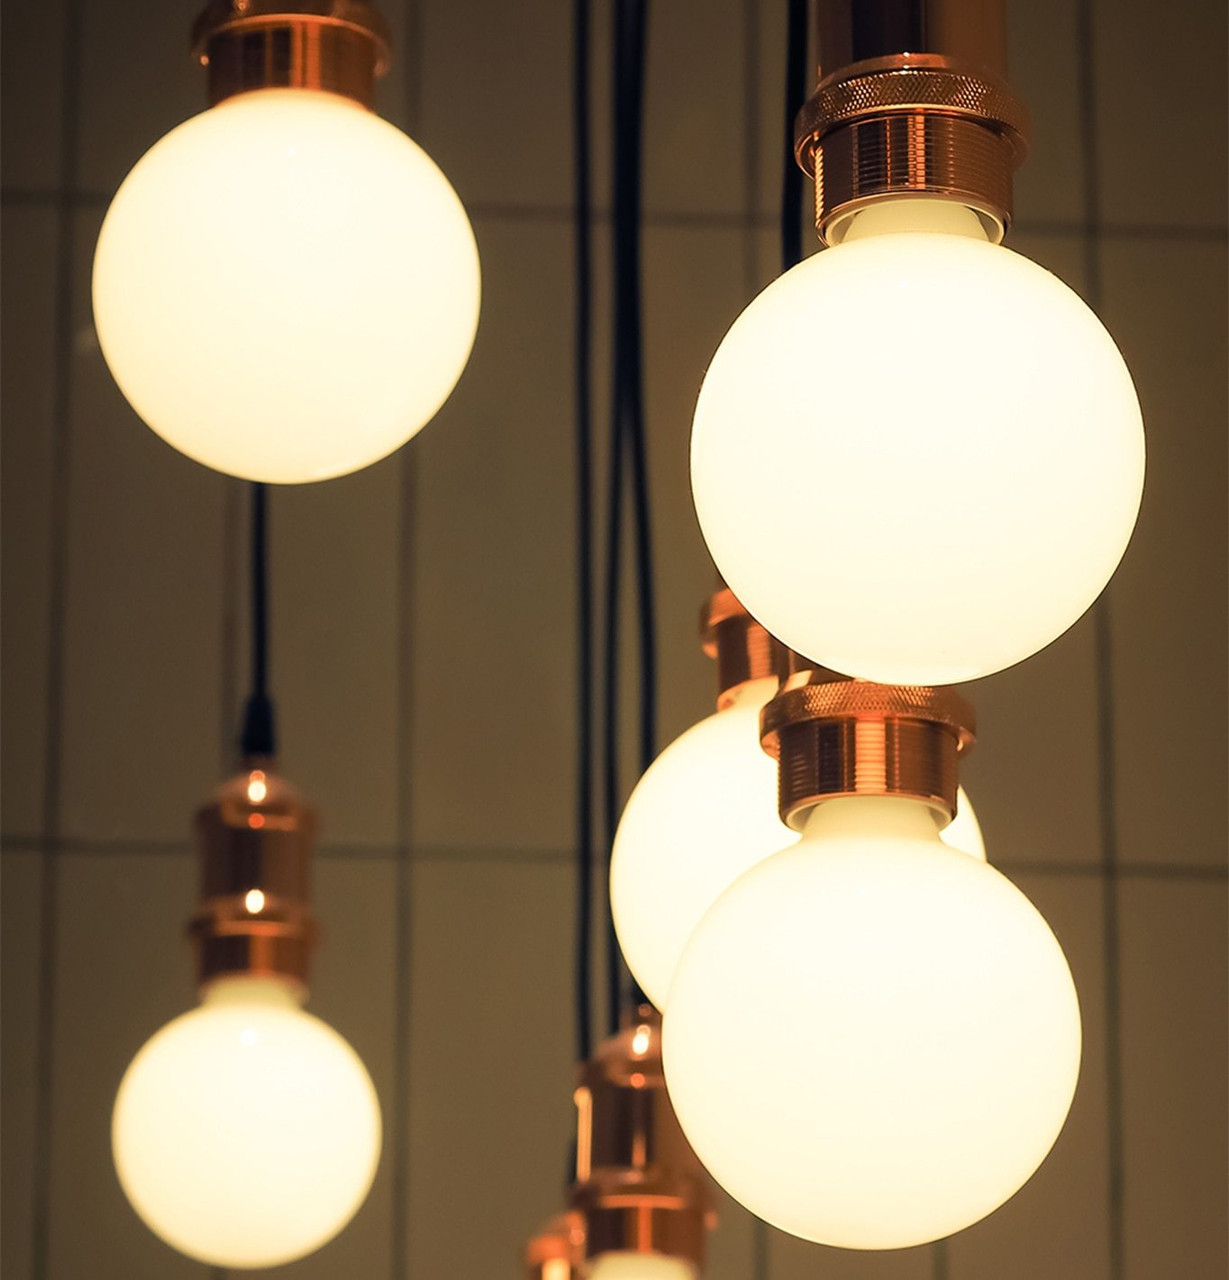 Crompton Lamps LED G125 Screw Light Bulbs